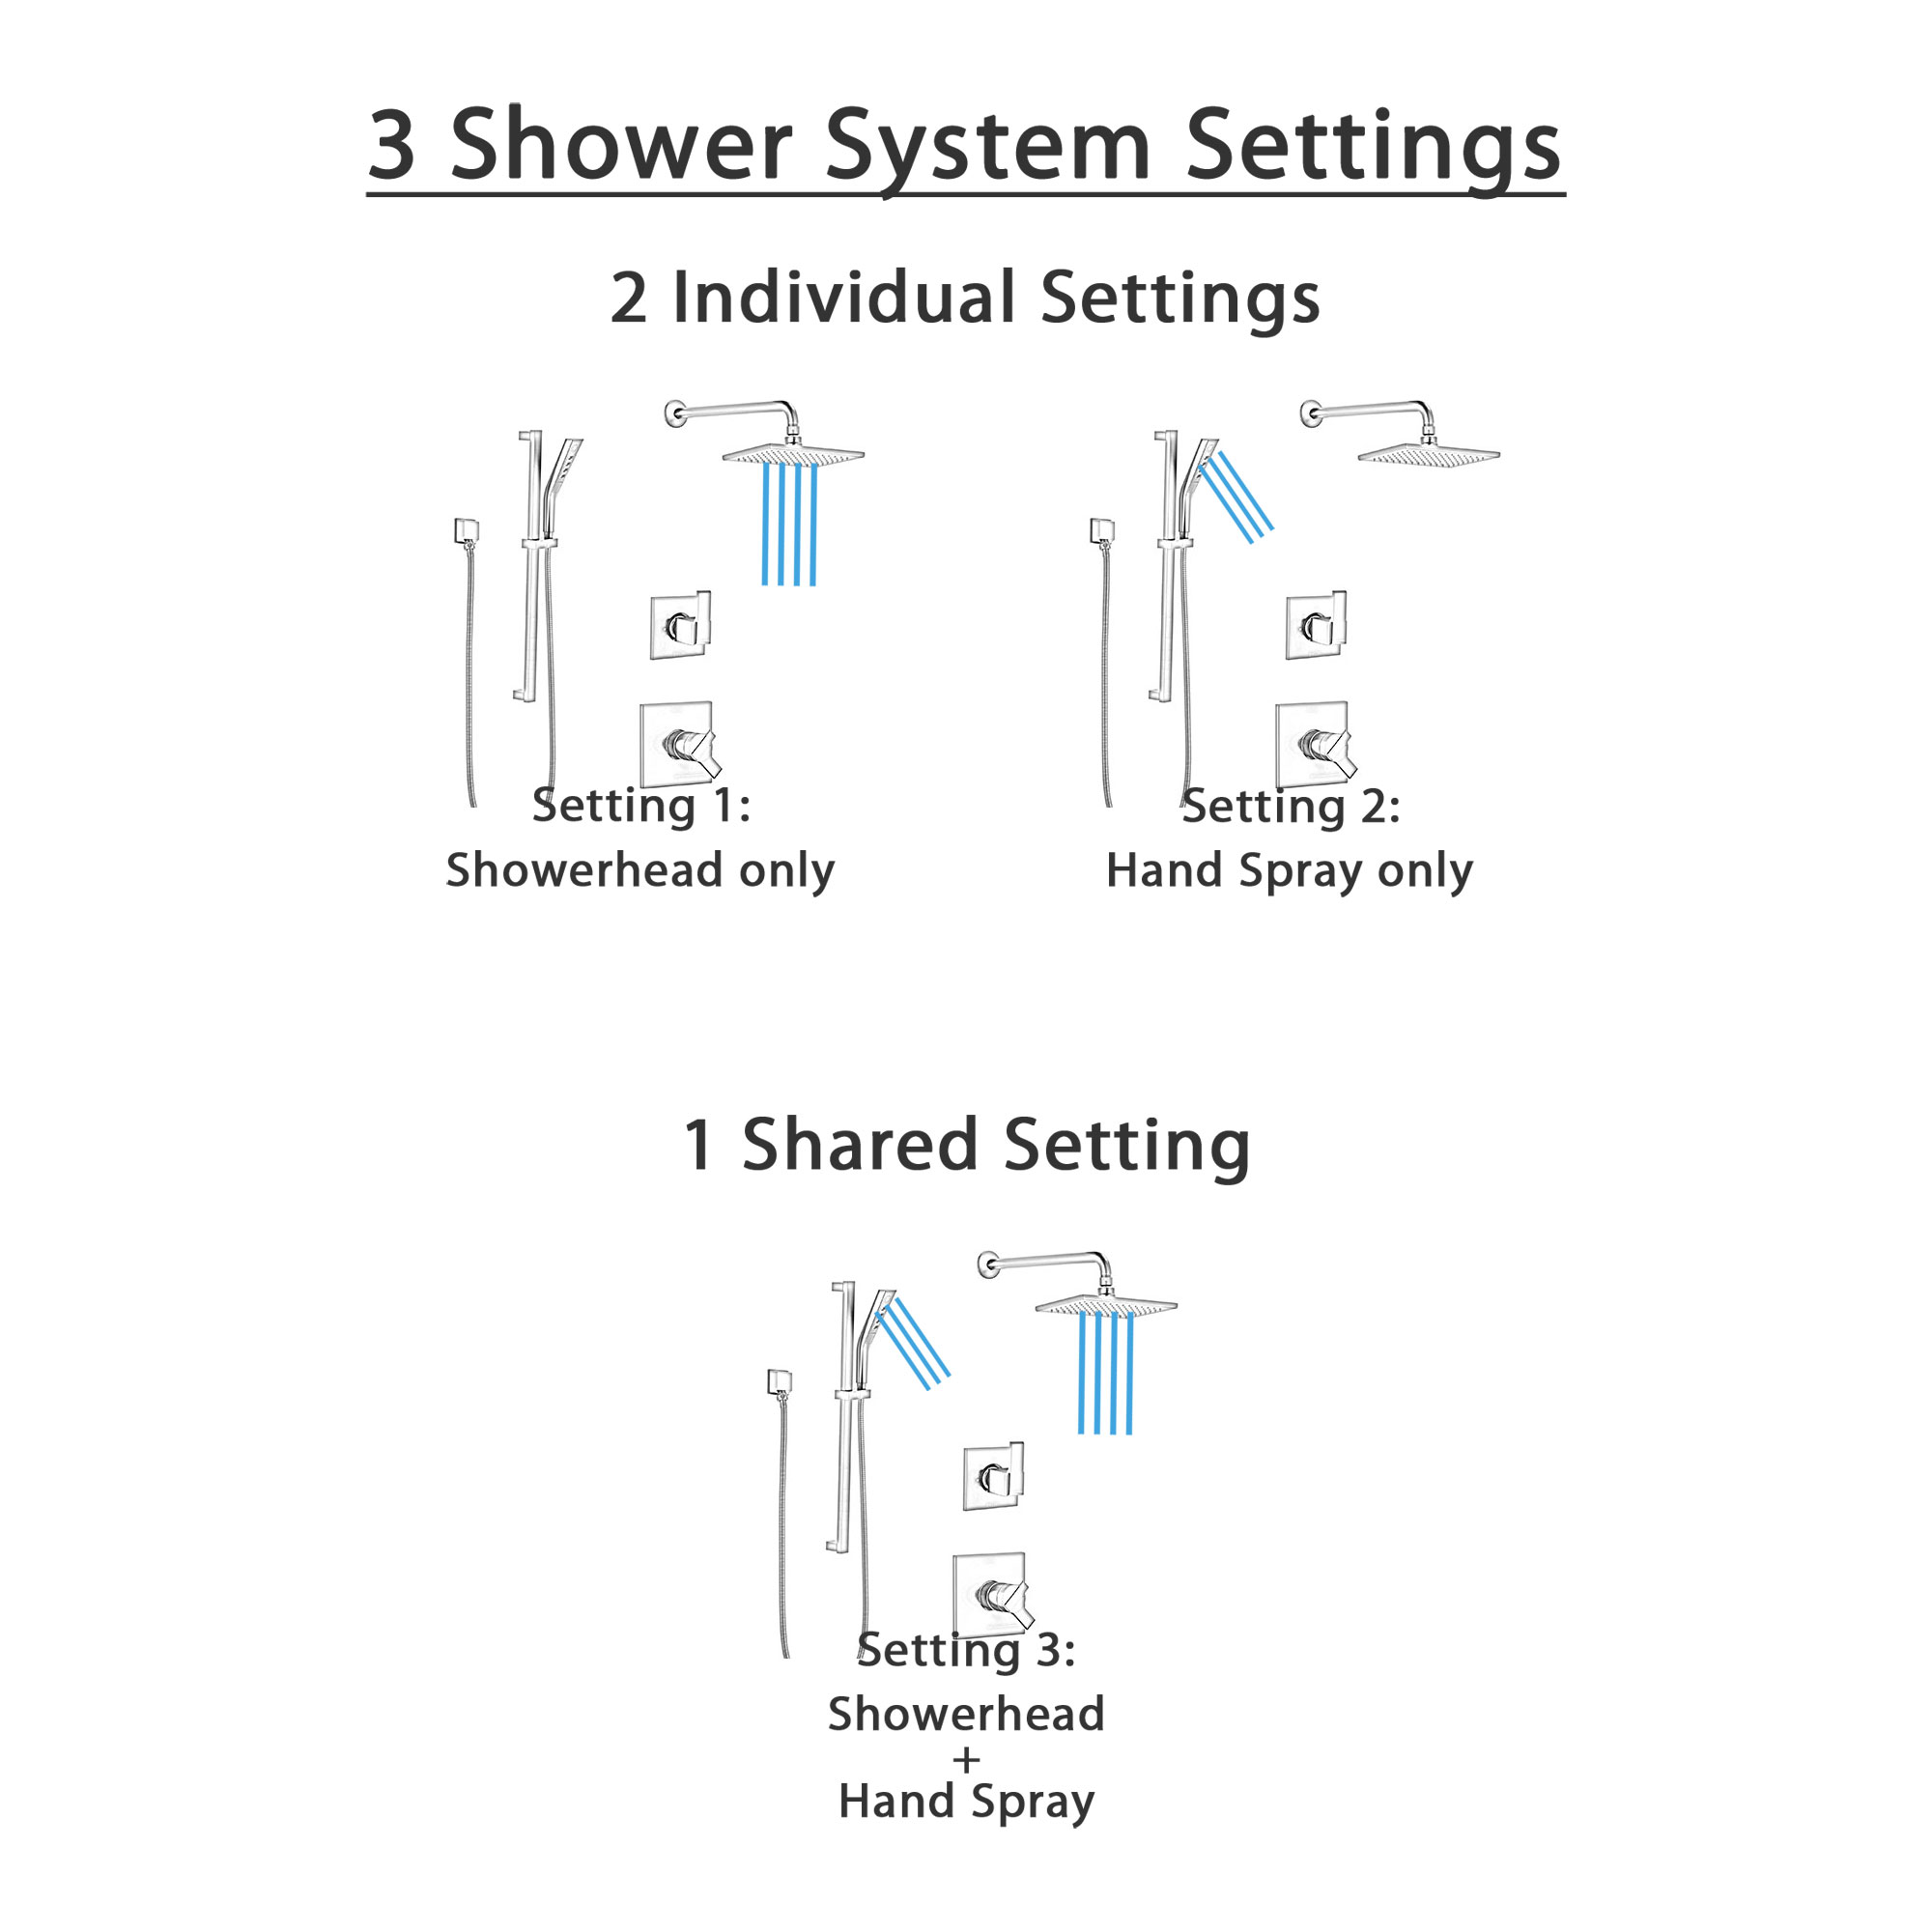 Delta Ara Matte Black Finish Wall Mounted Rain Showerhead and Hand Shower Sprayer on Slidebar Modern Shower System with Diverter SS17673BL4